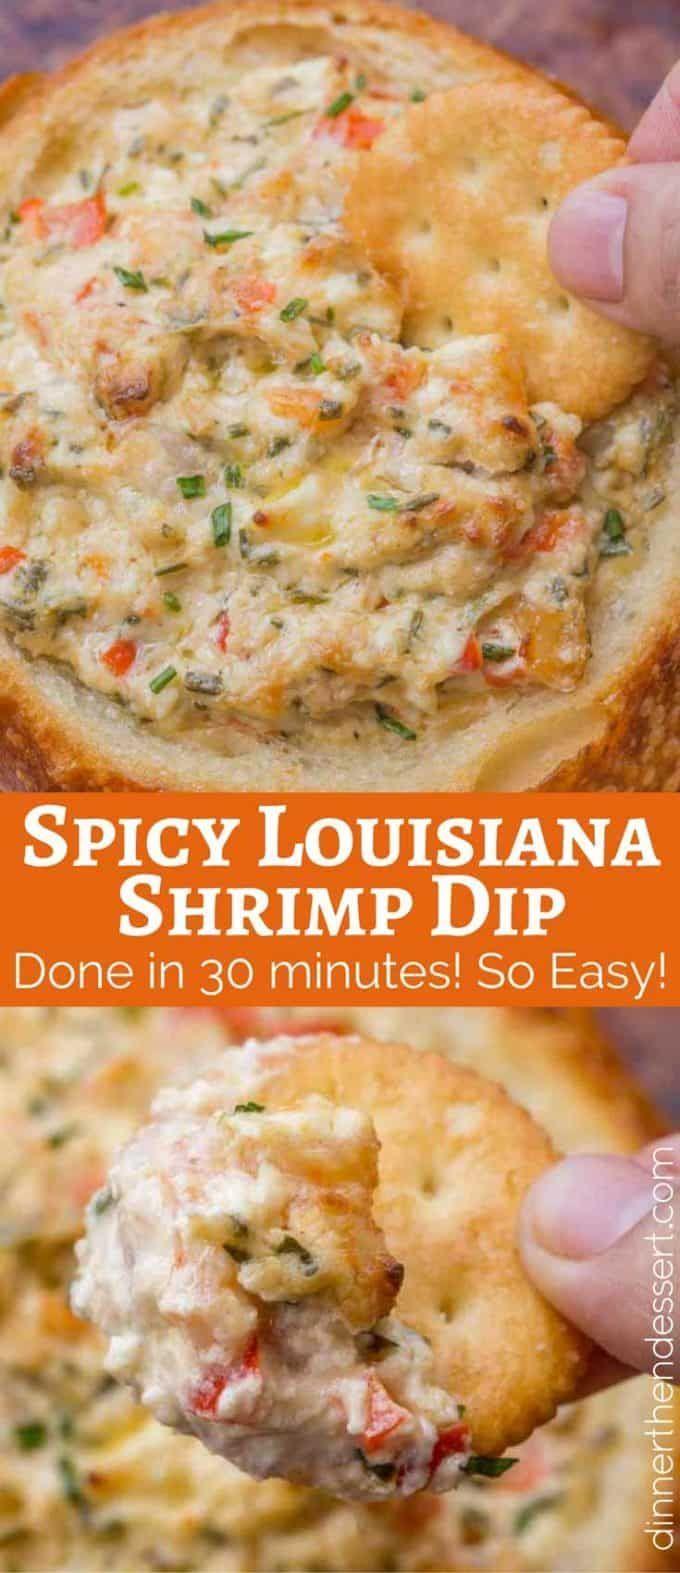 Spicy Louisiana Shrimp Dip, Appetizers, Cajun